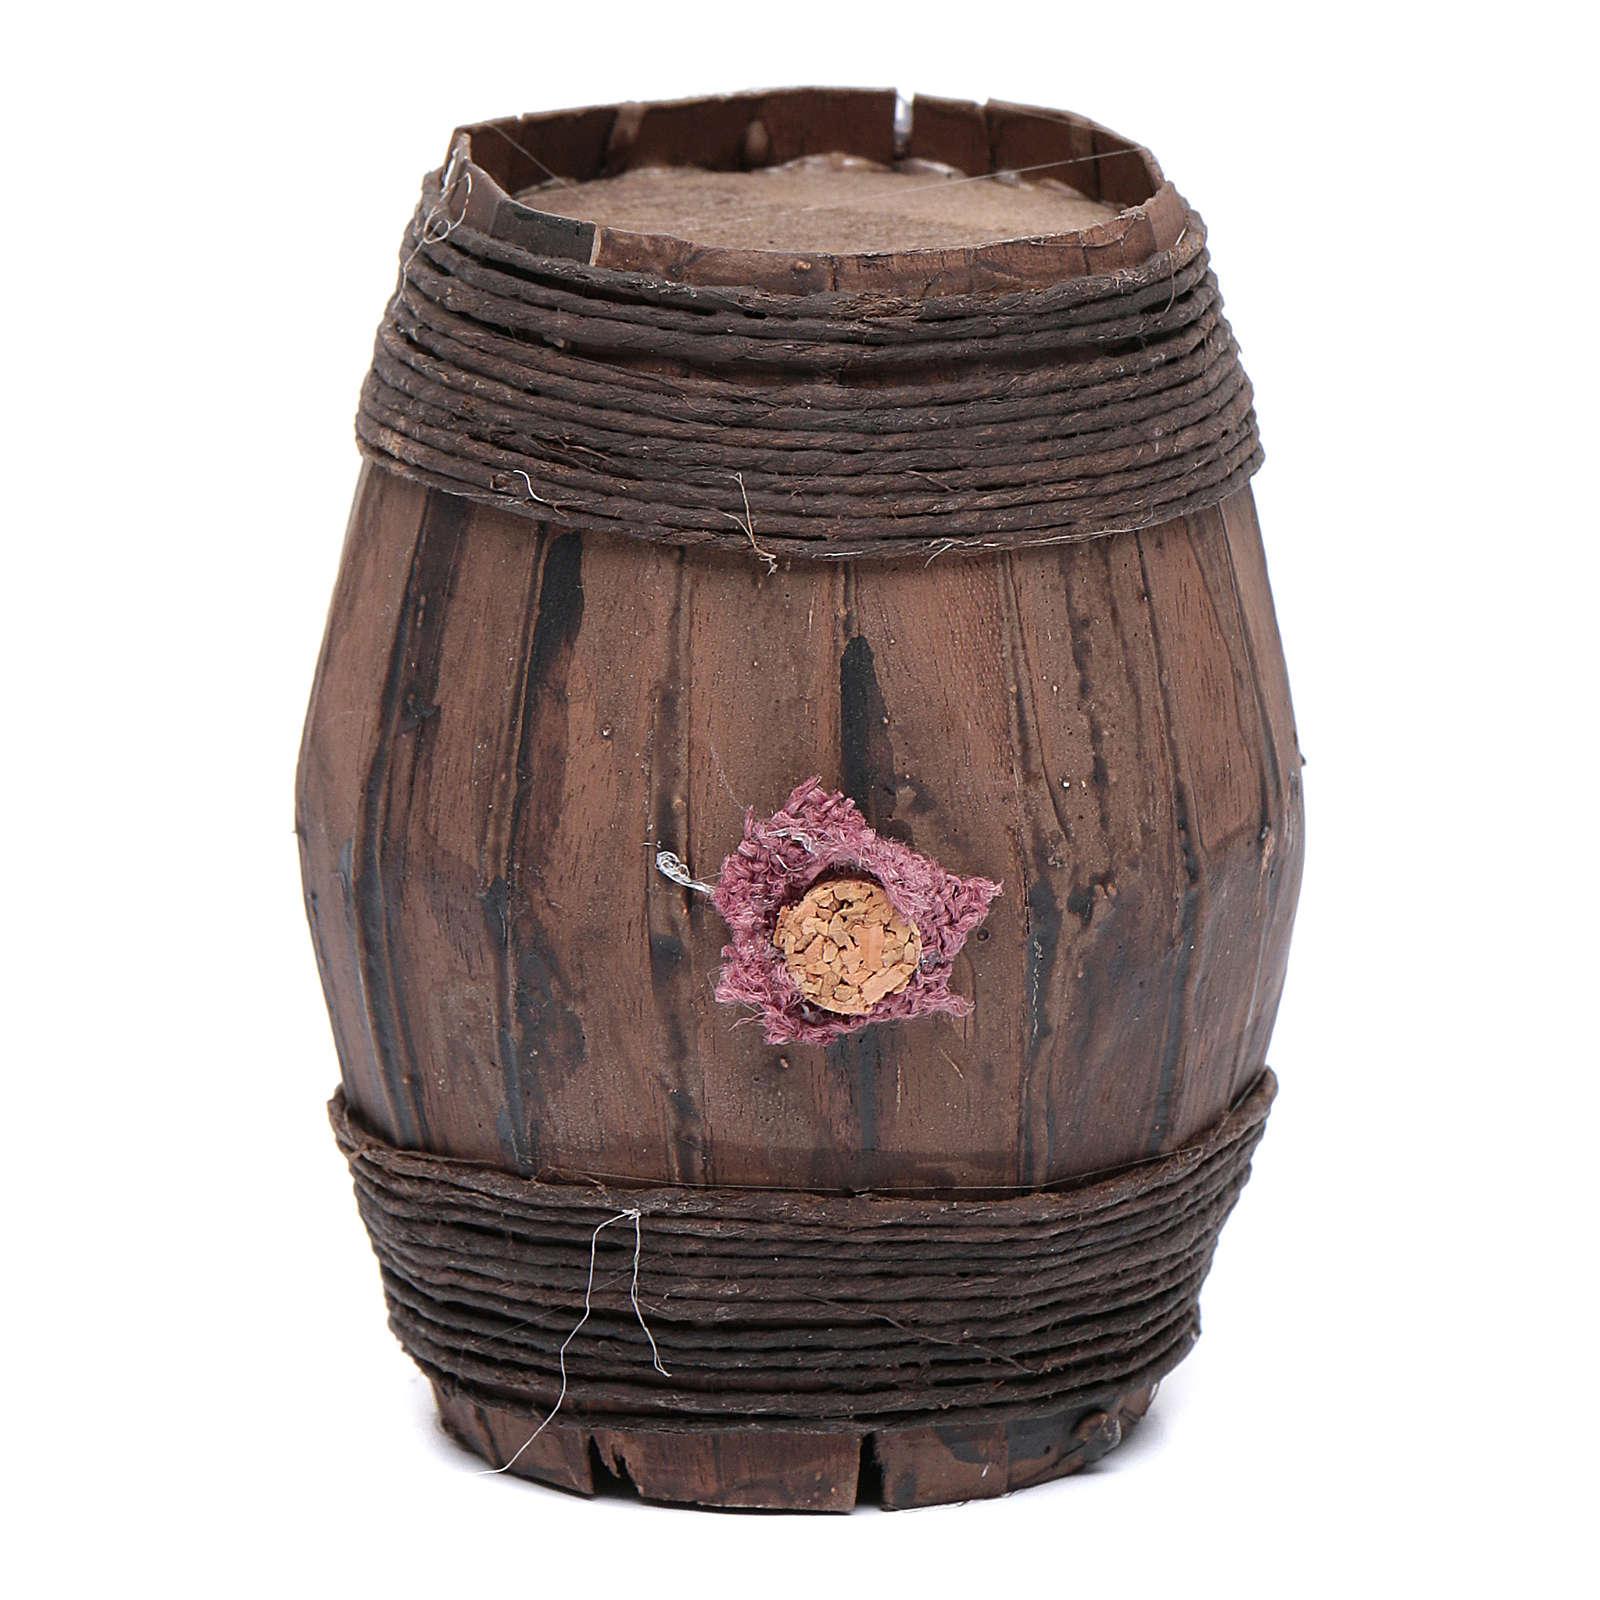 Wooden barrel sized 9 cm for Neapolitan nativity scene 4